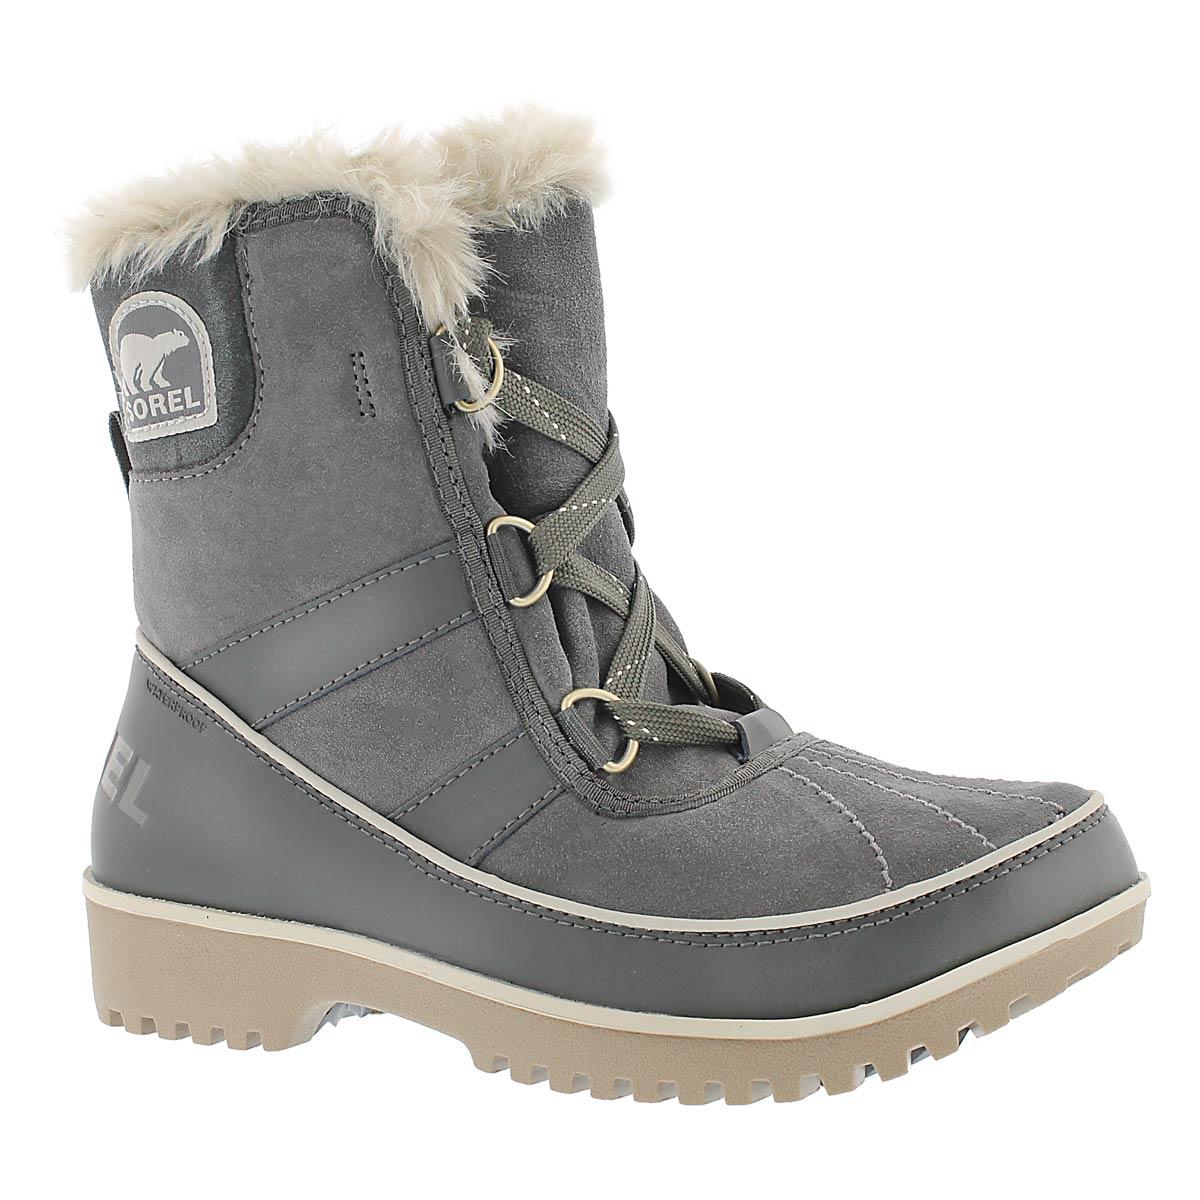 Women's TIVOLI II quarry mid shaft winter boots